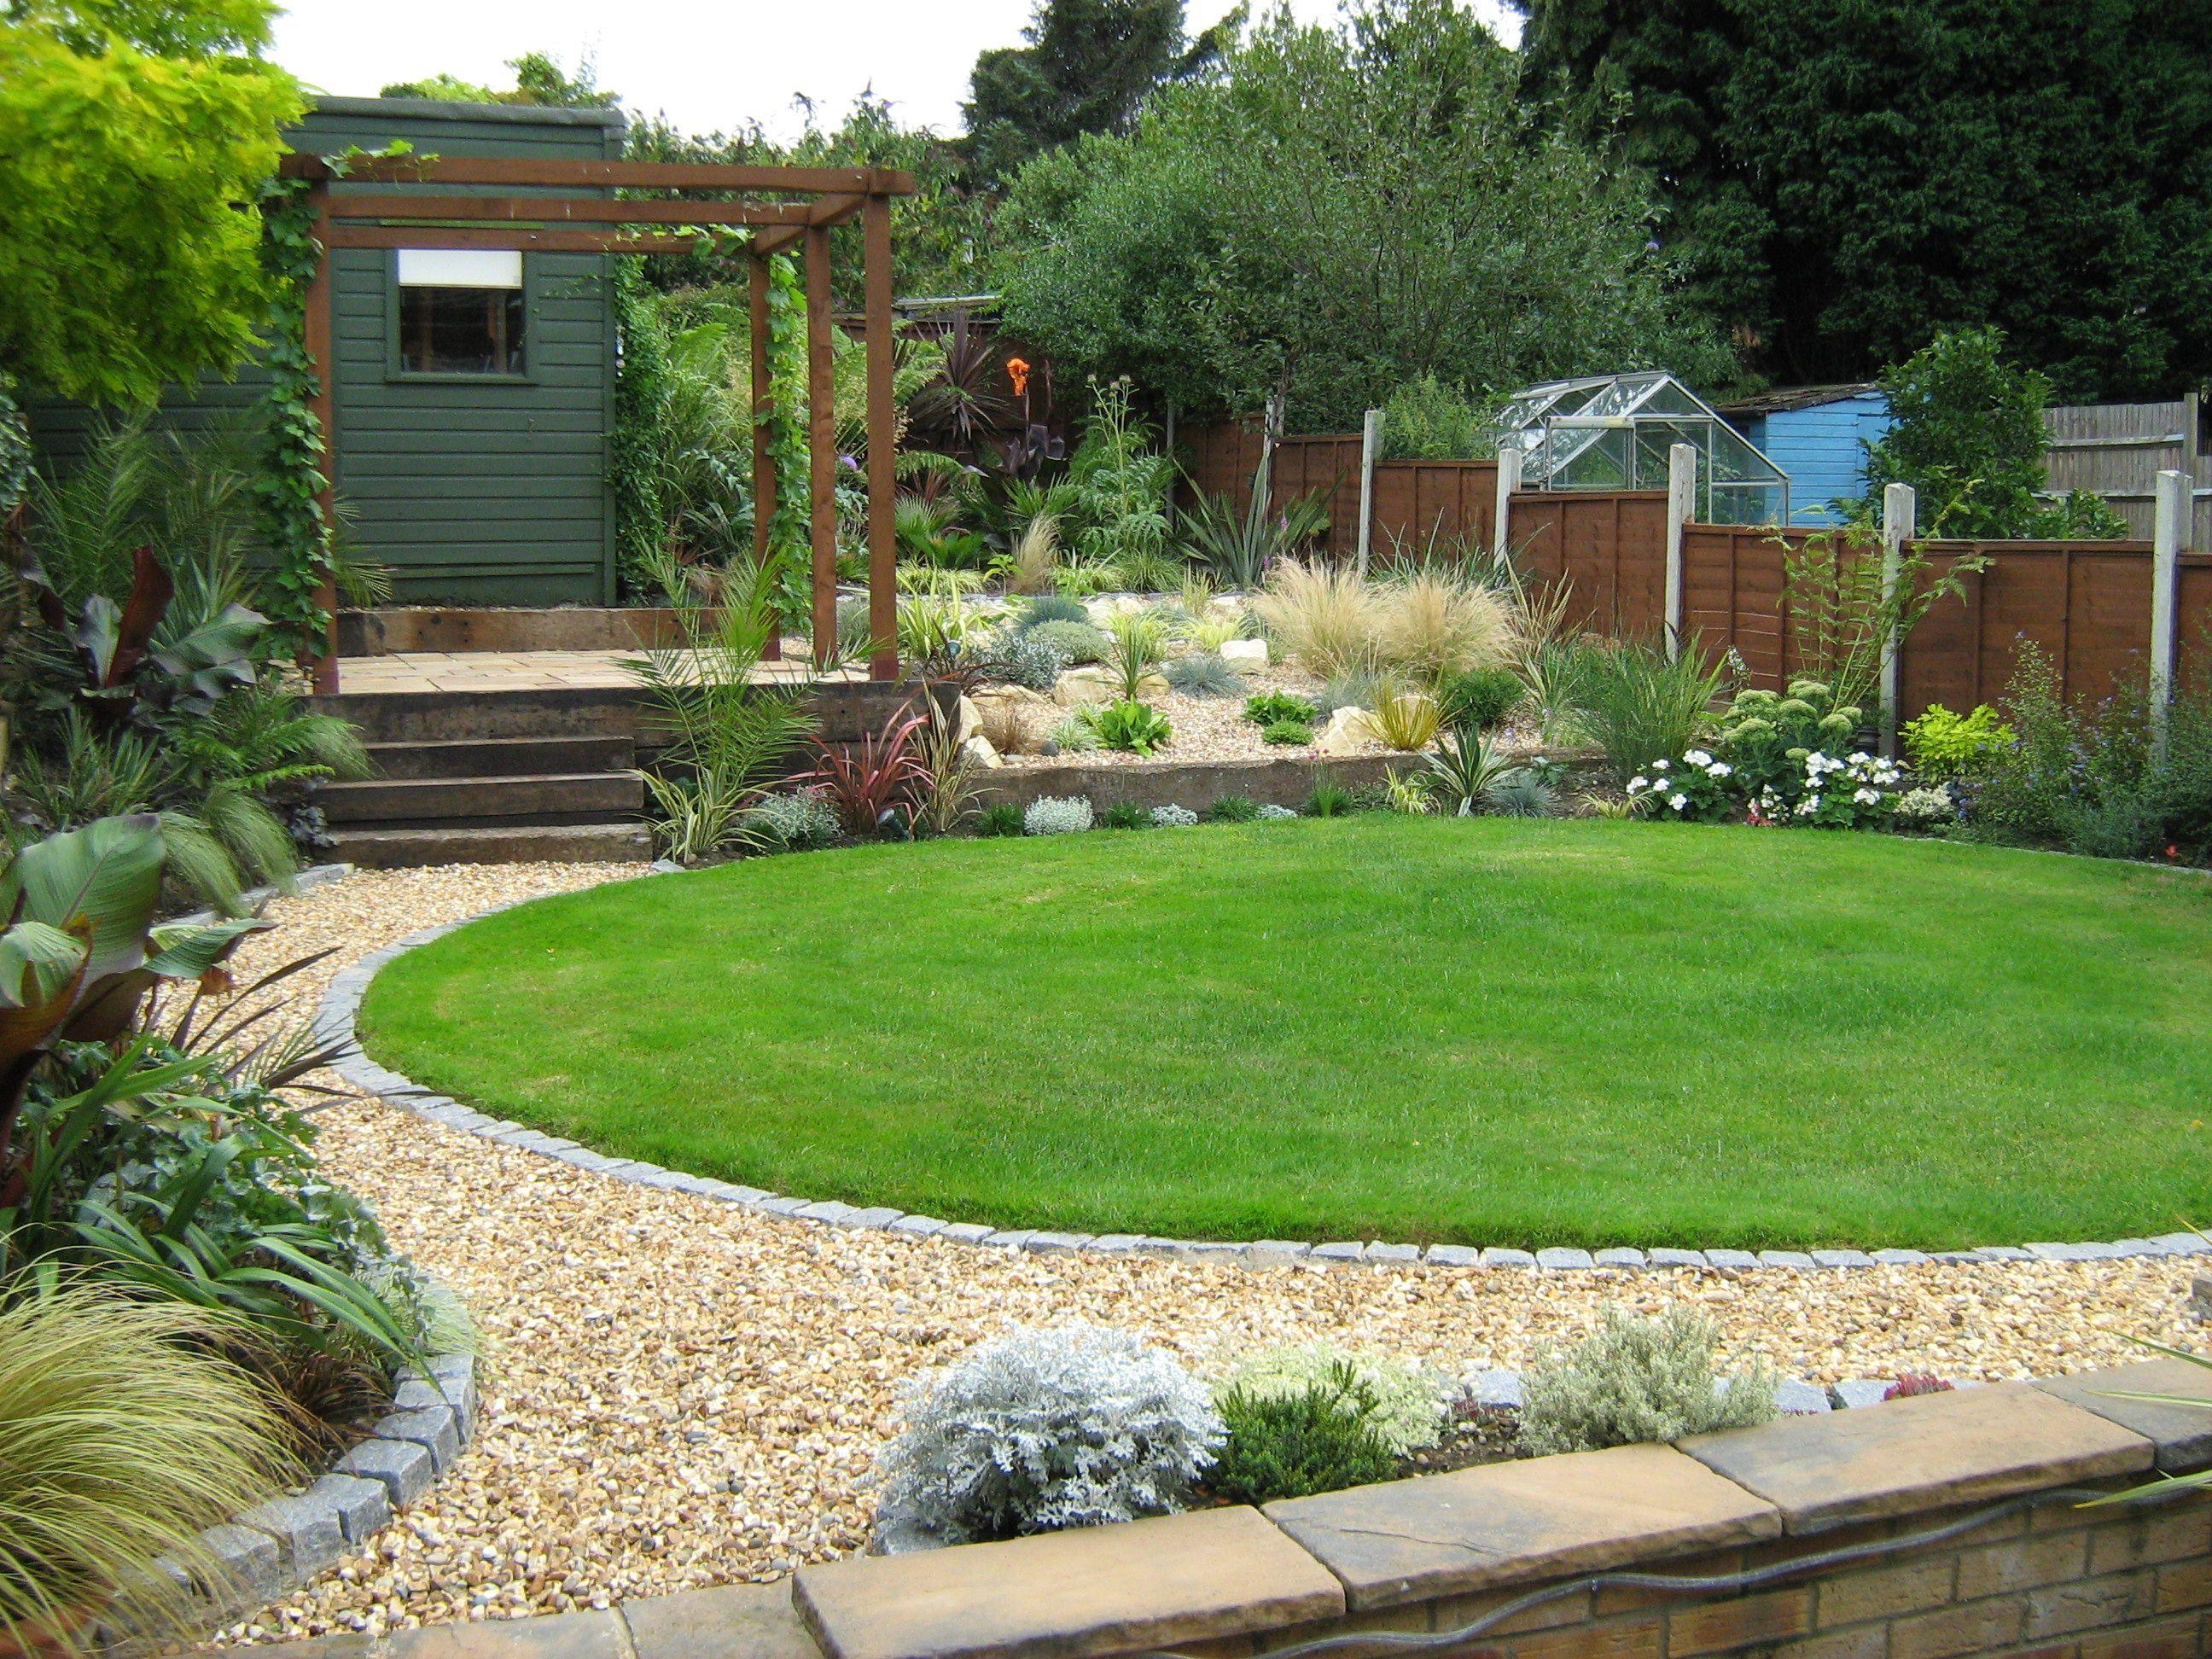 gravel path with granite sett edging & circular lawn for ...